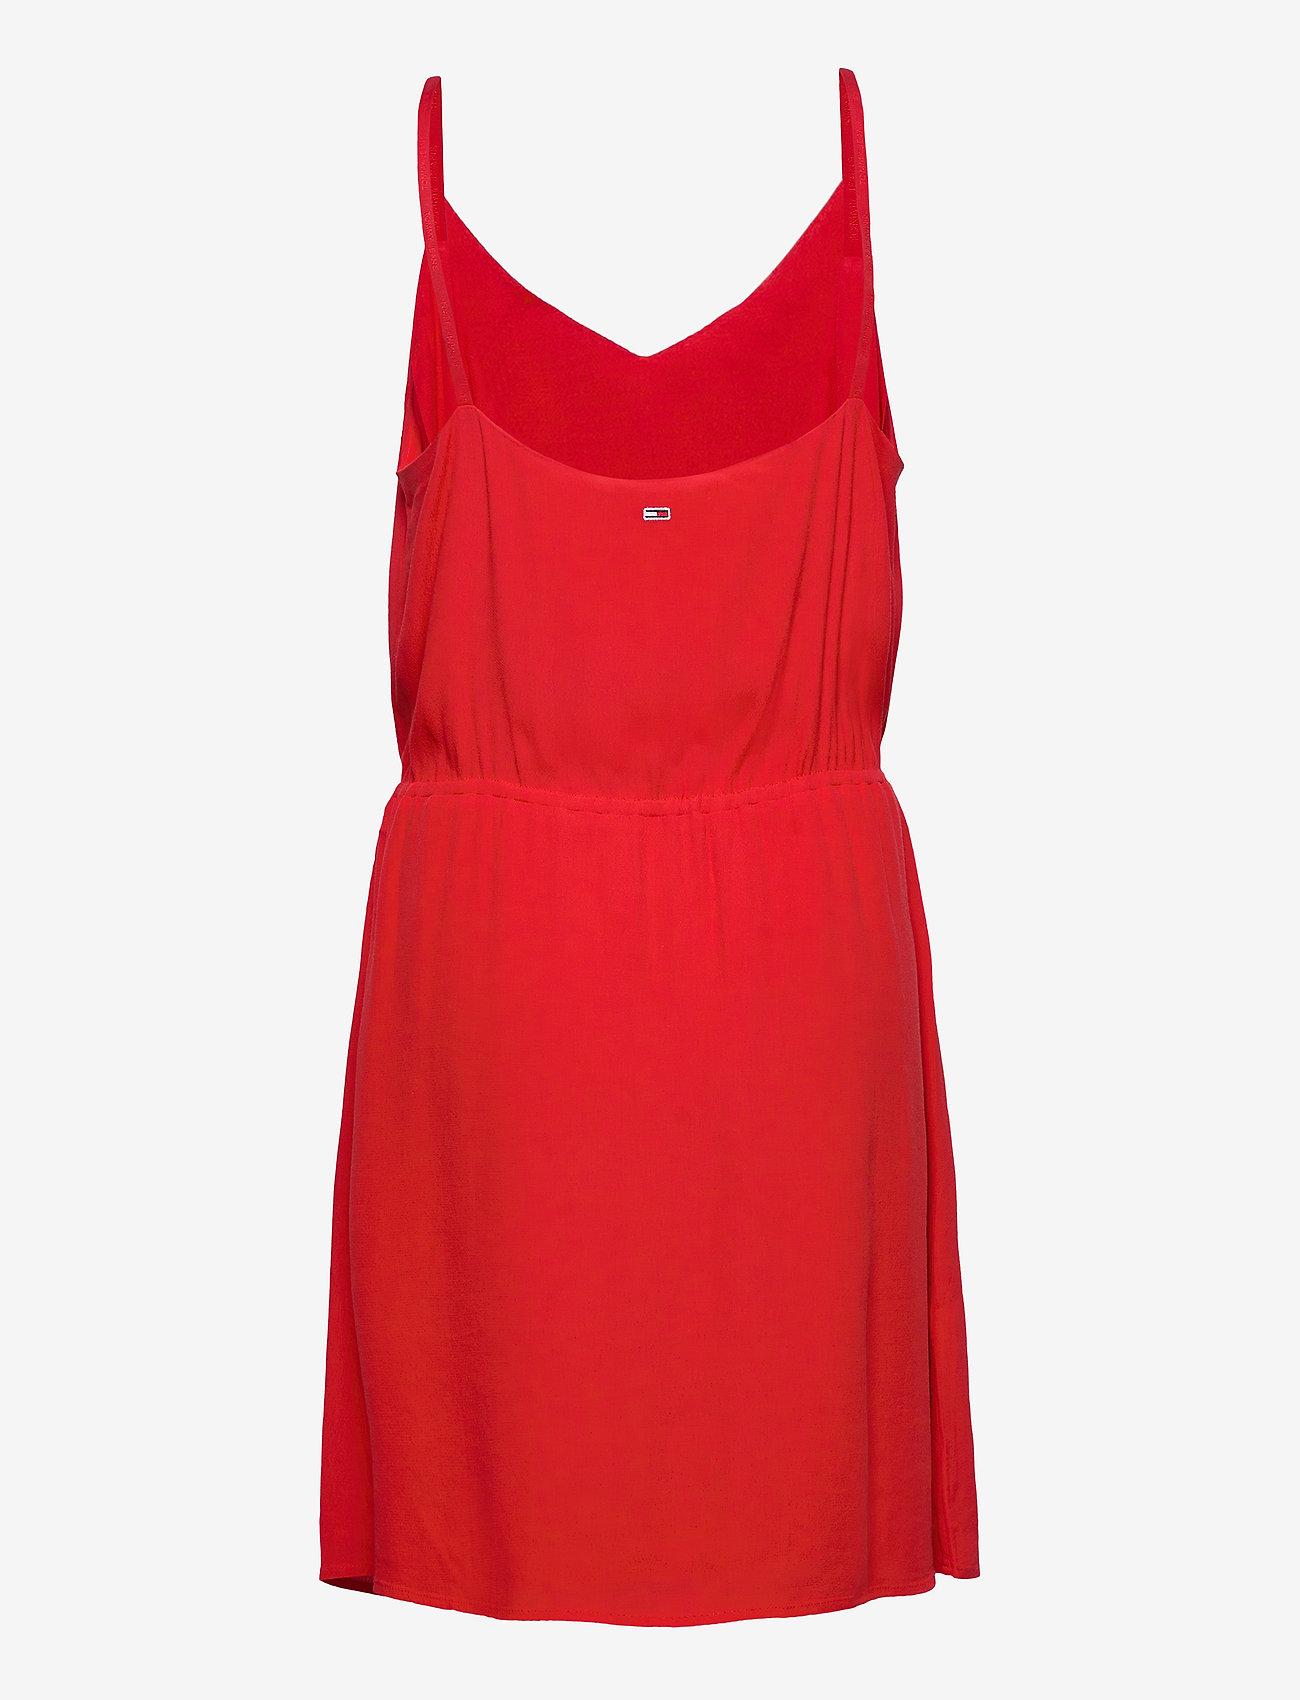 Tommy Jeans - TJW ESSENTIAL STRAP - short dresses - deep crimson - 1